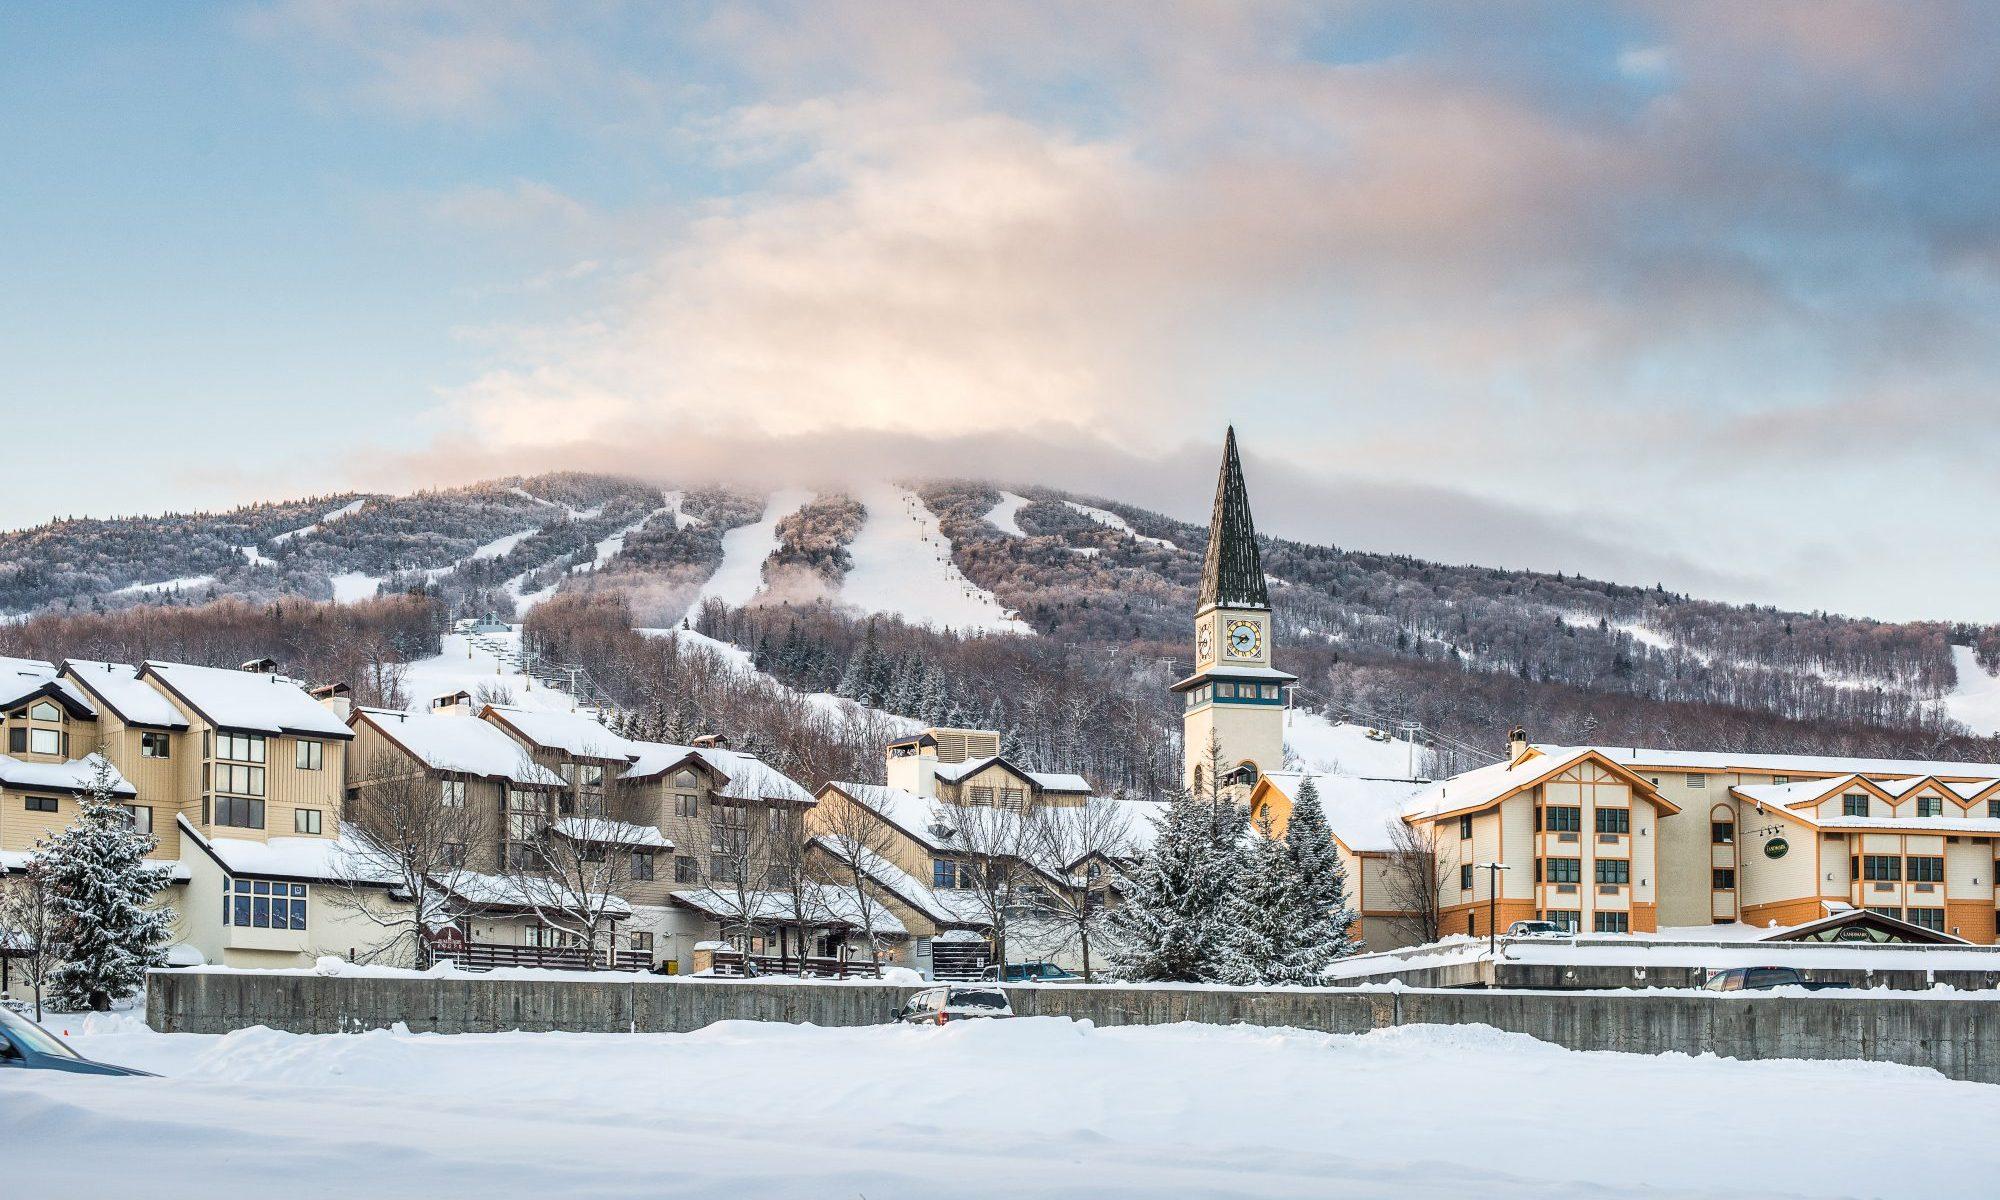 Stratton Mountain- Vermont- Alterra Mountain Company Announces $181 Million in Capital Improvements for the 2019/2020 Winter Season.